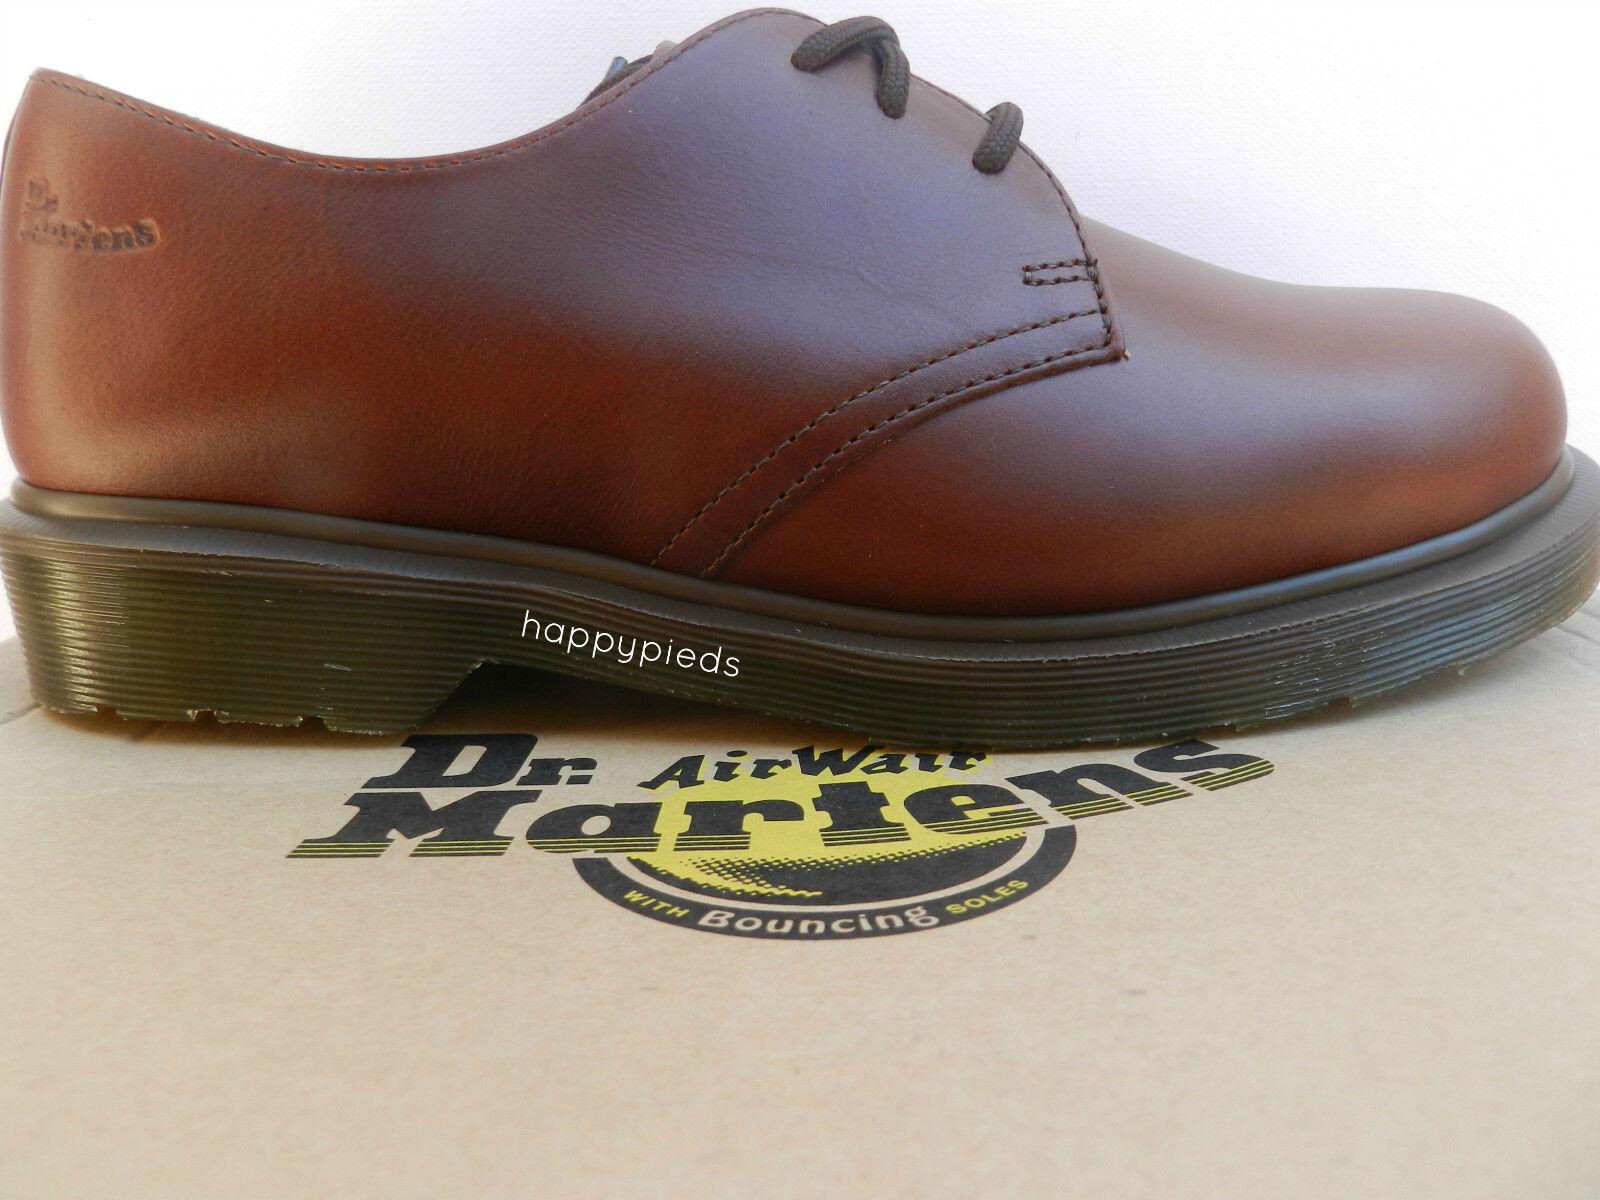 Dr Martens 1461 PW shoes 40 Analine Richelieu Derbies Mocassins UK6.5 Neuf